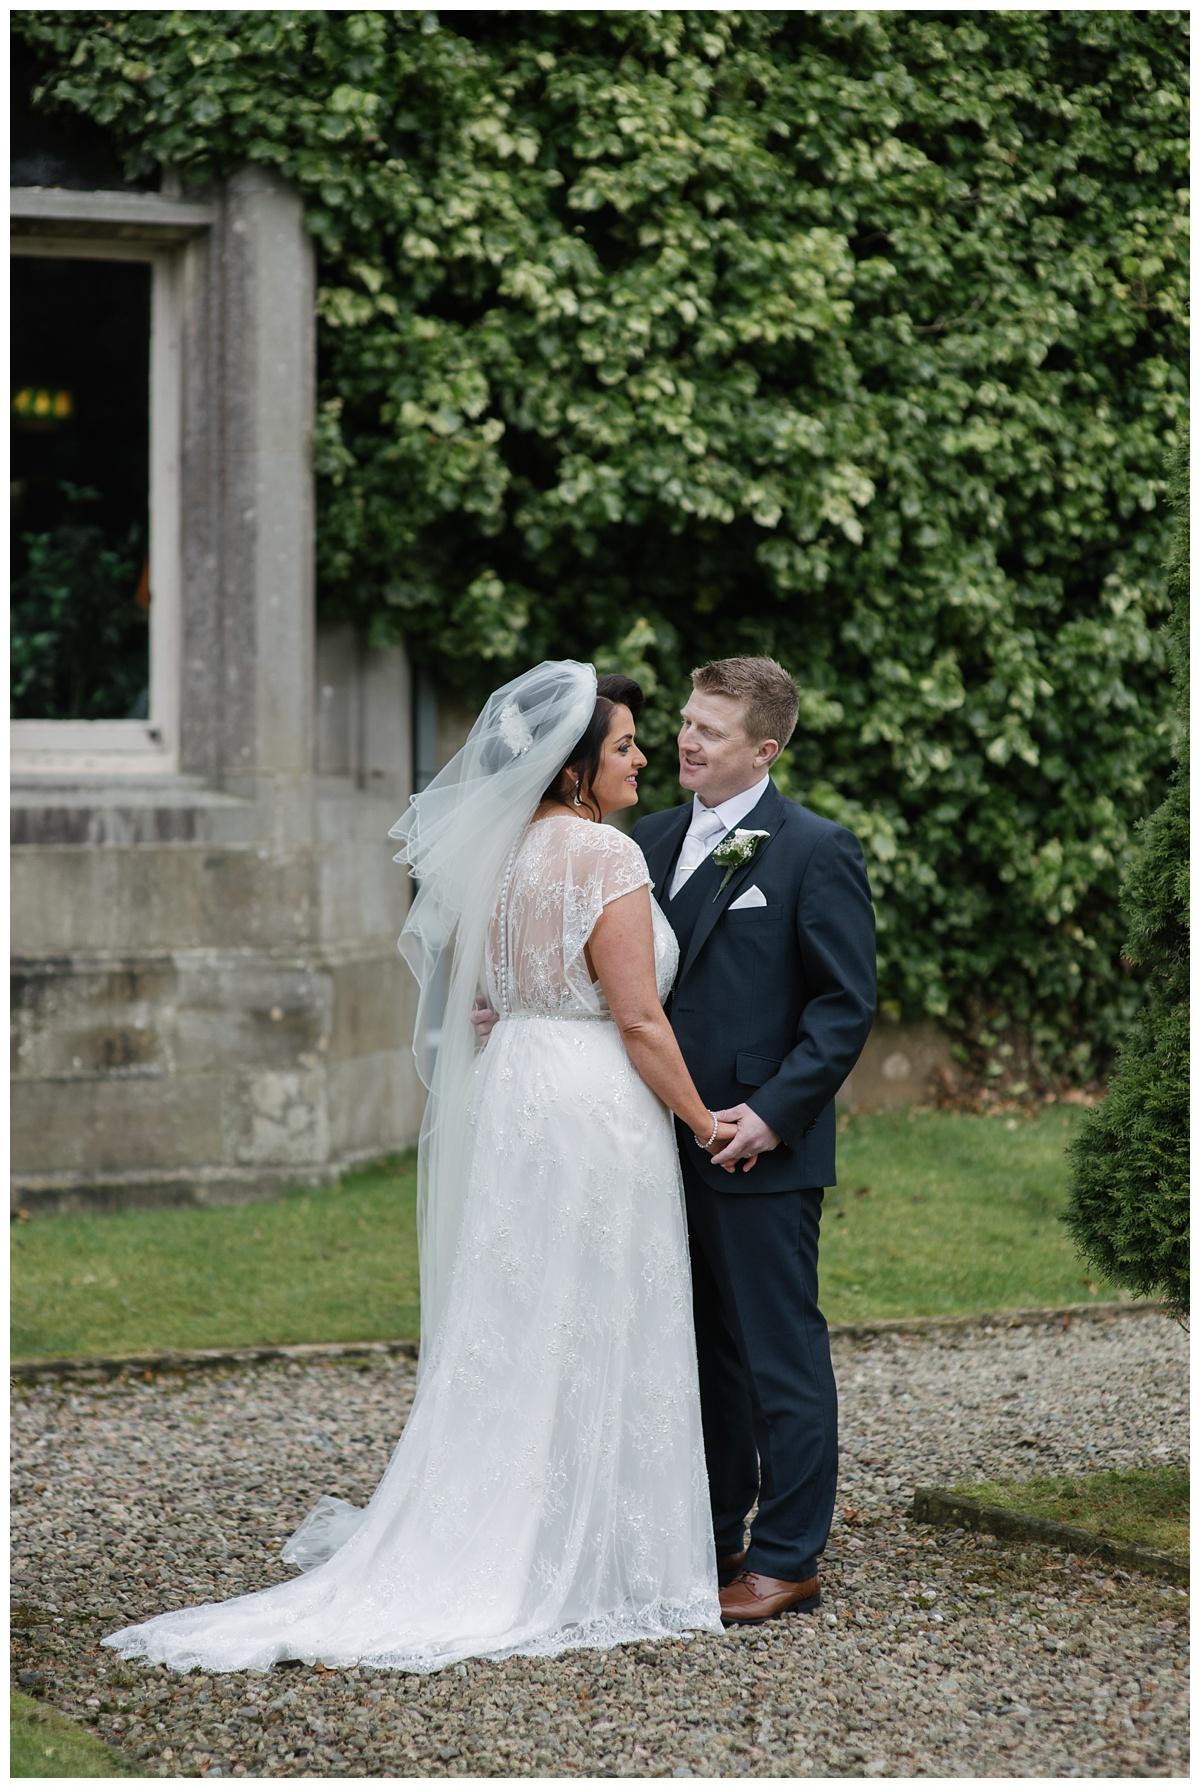 una_paul_cavan_crystal_hotel_wedding_jude_browne_photography_0064.jpg